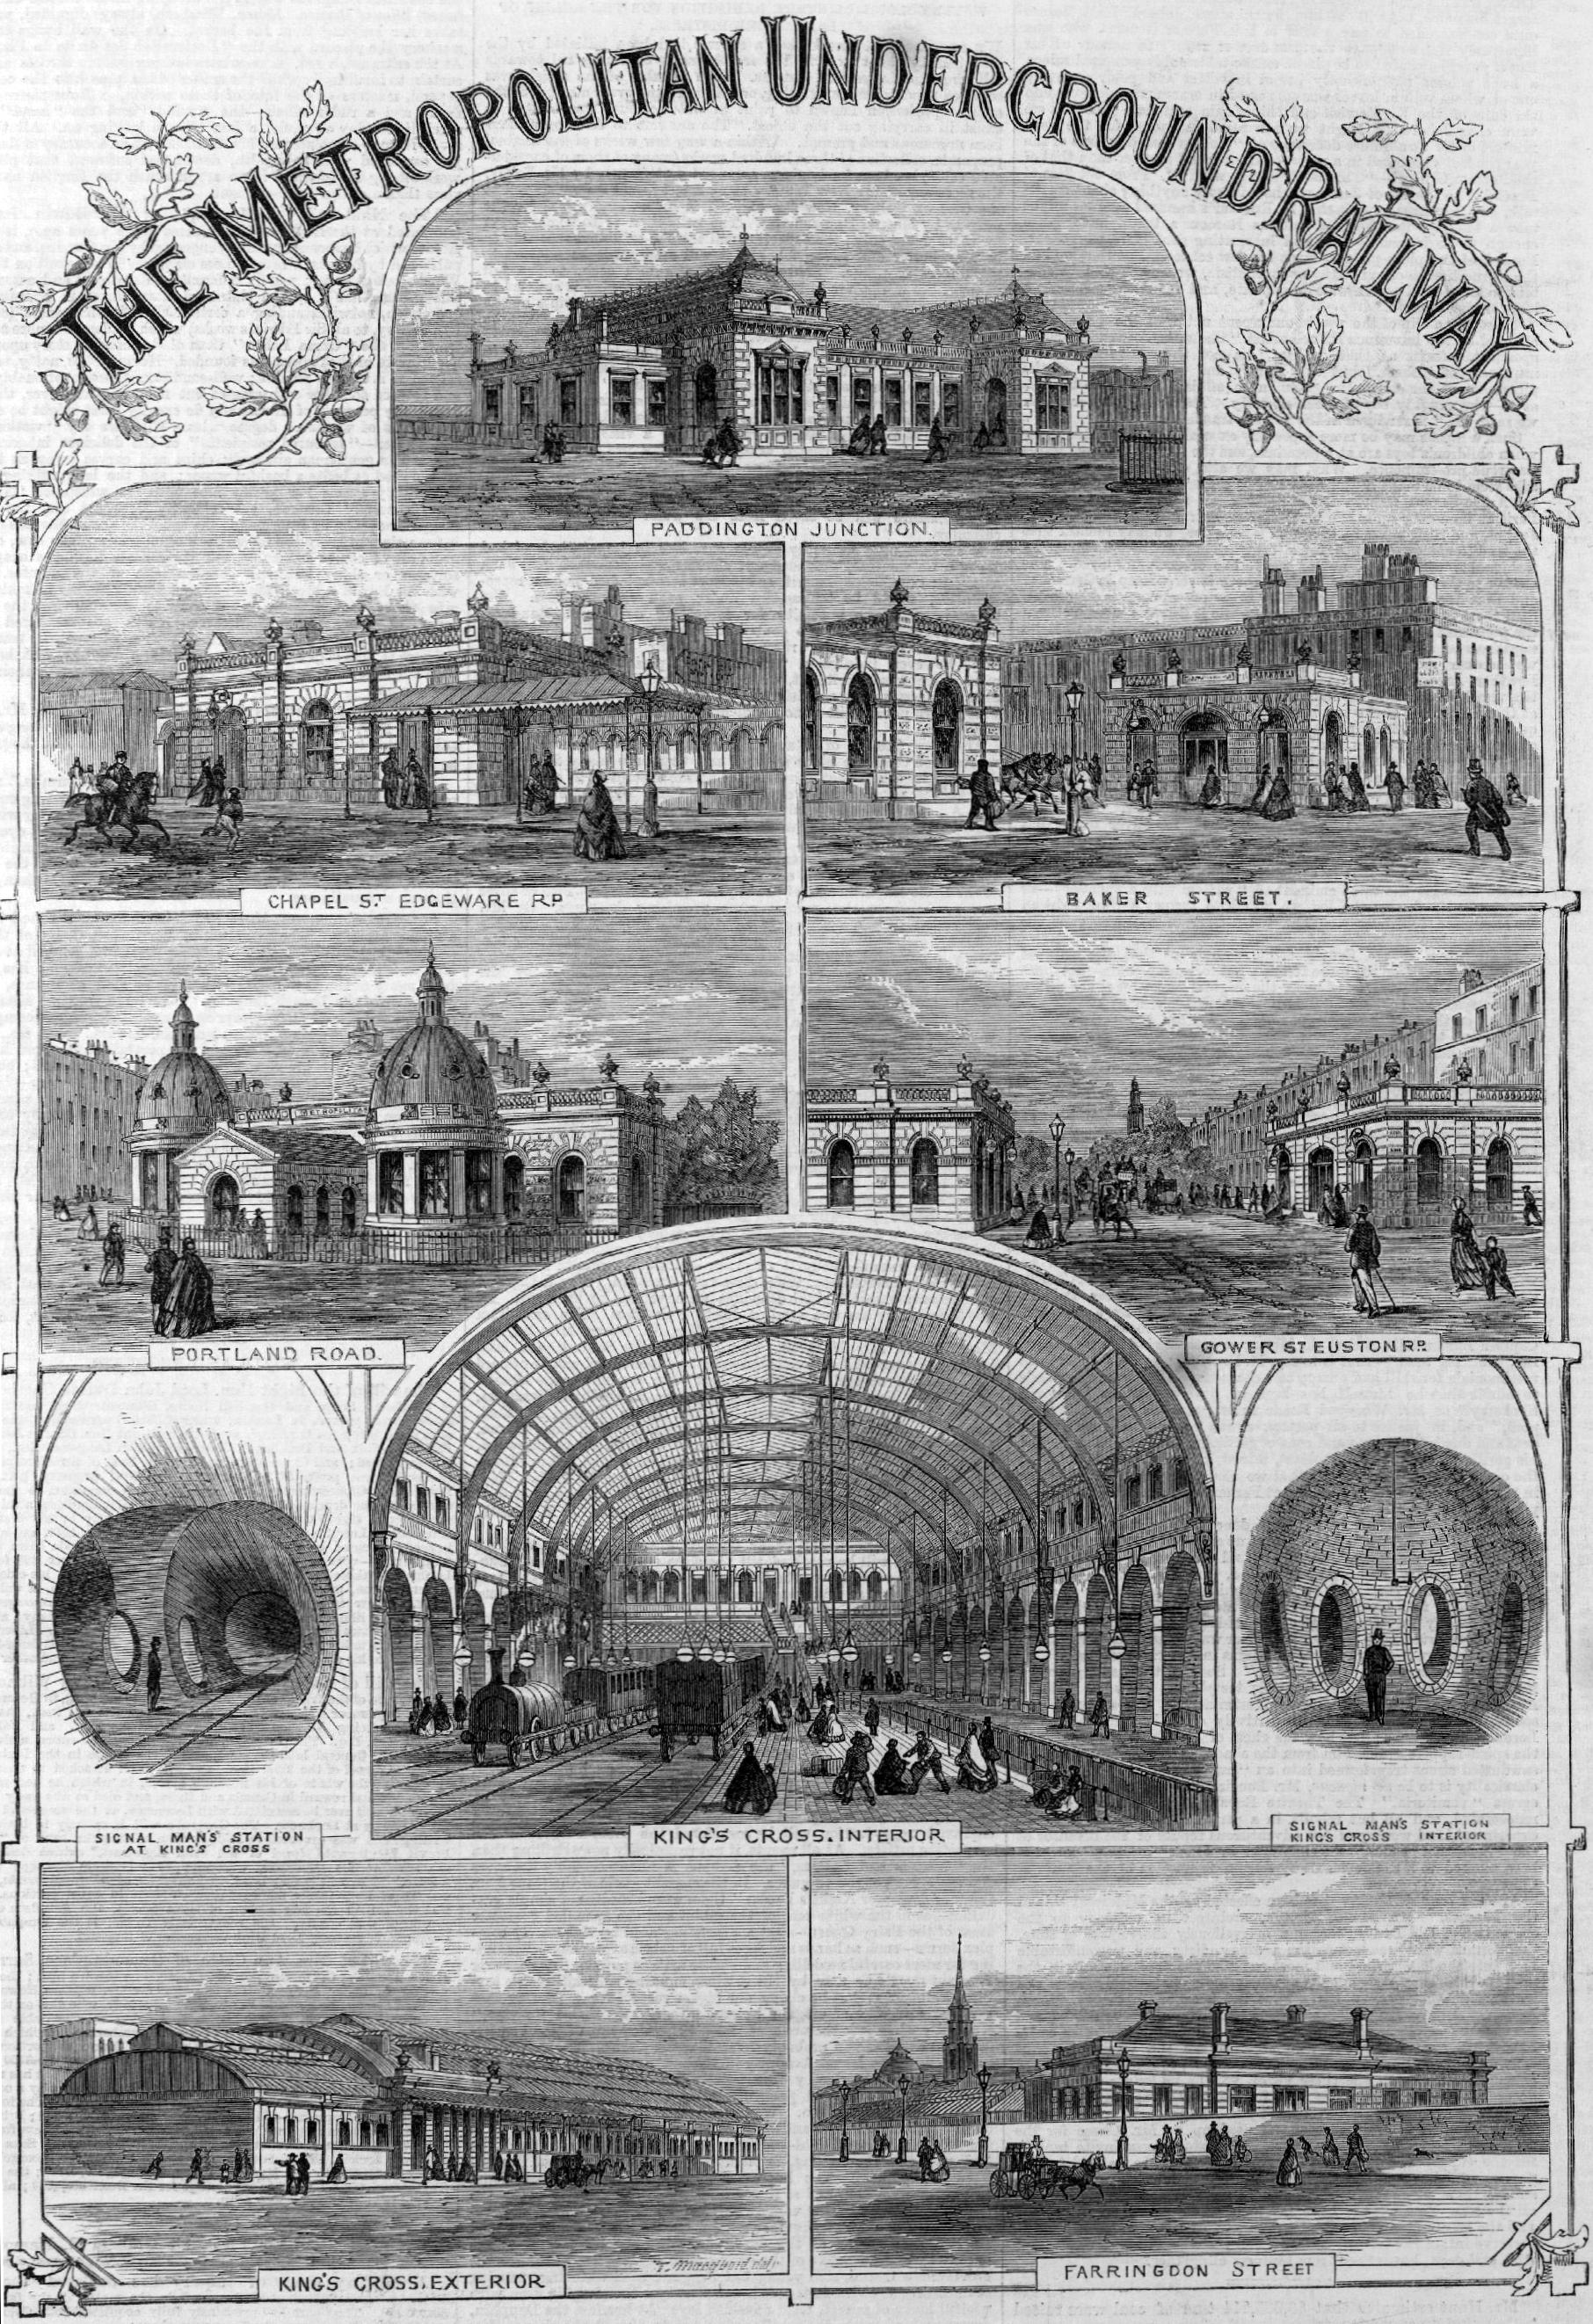 Metropolitan_Underground_Railway_stations.jpg